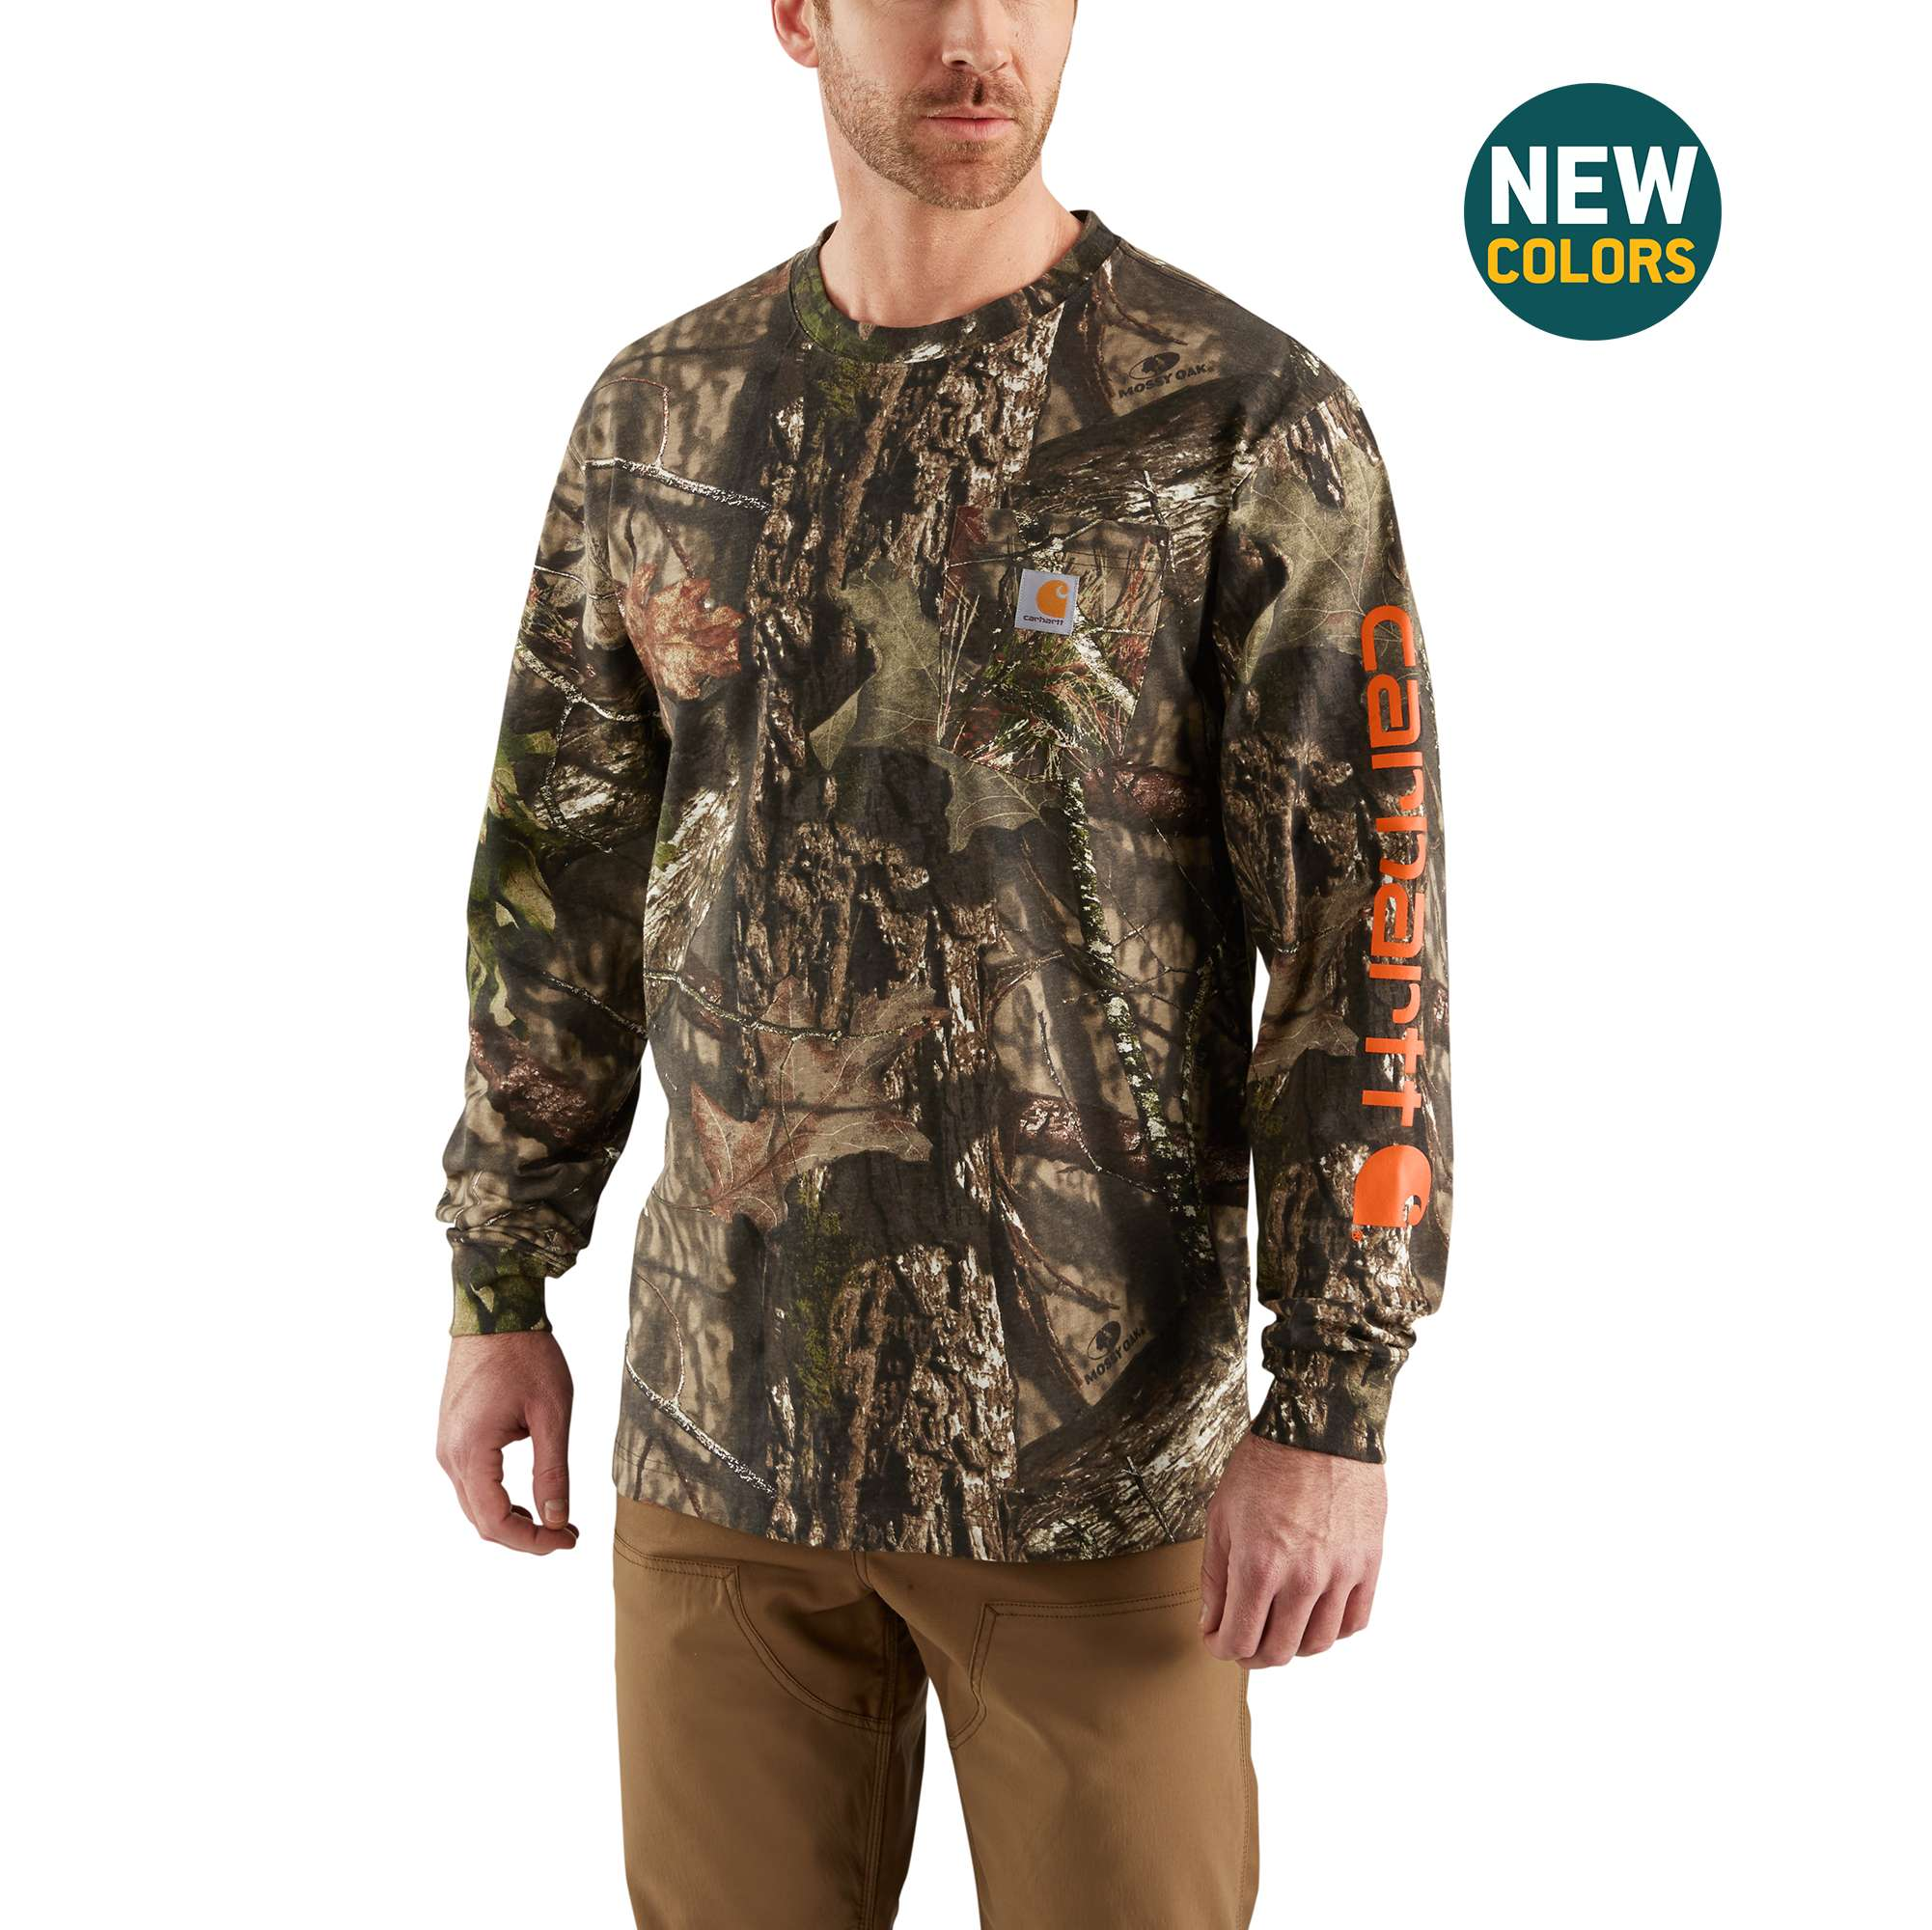 006d043aaa1ce Buy Mens Workwear Gphc Camo Sleeve Long Sleeve T-Shirt - Carhartt ...